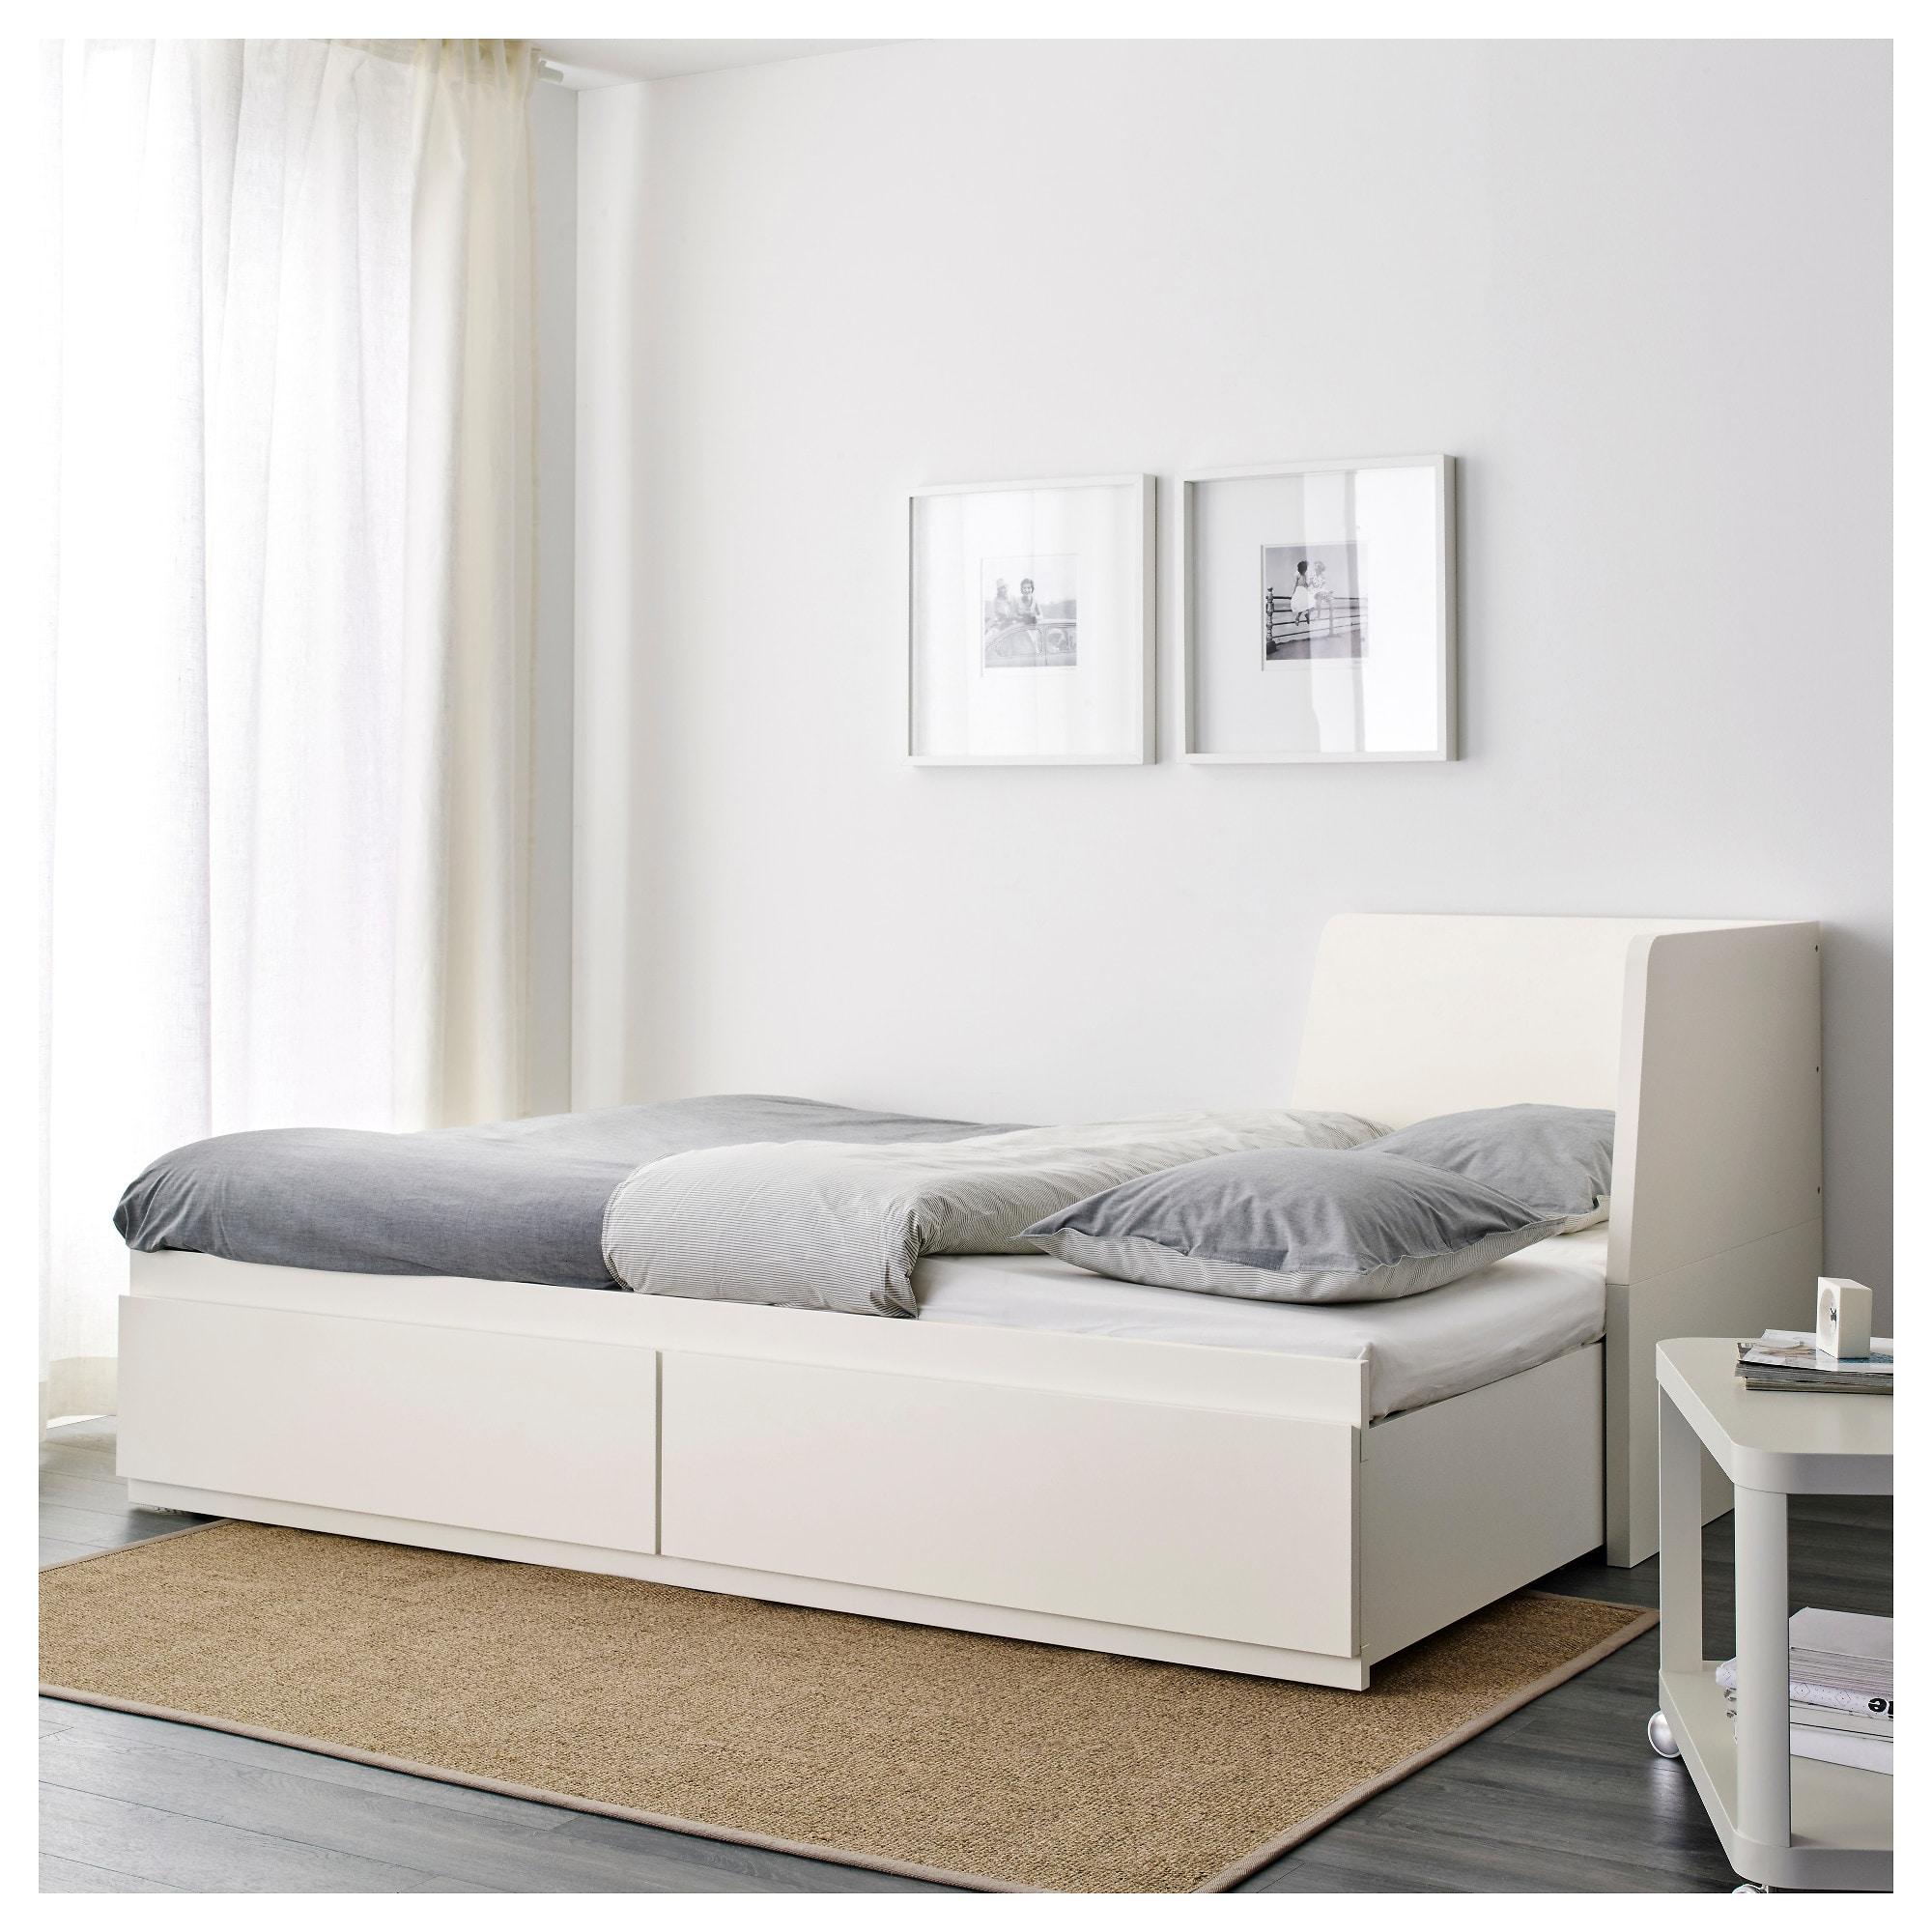 Flekke Tagesbett 2 Schubladen 2 Matratzen Weiss Moshult Fest Ikea Osterreich Ikea Tagesbett Tagesbett Bett